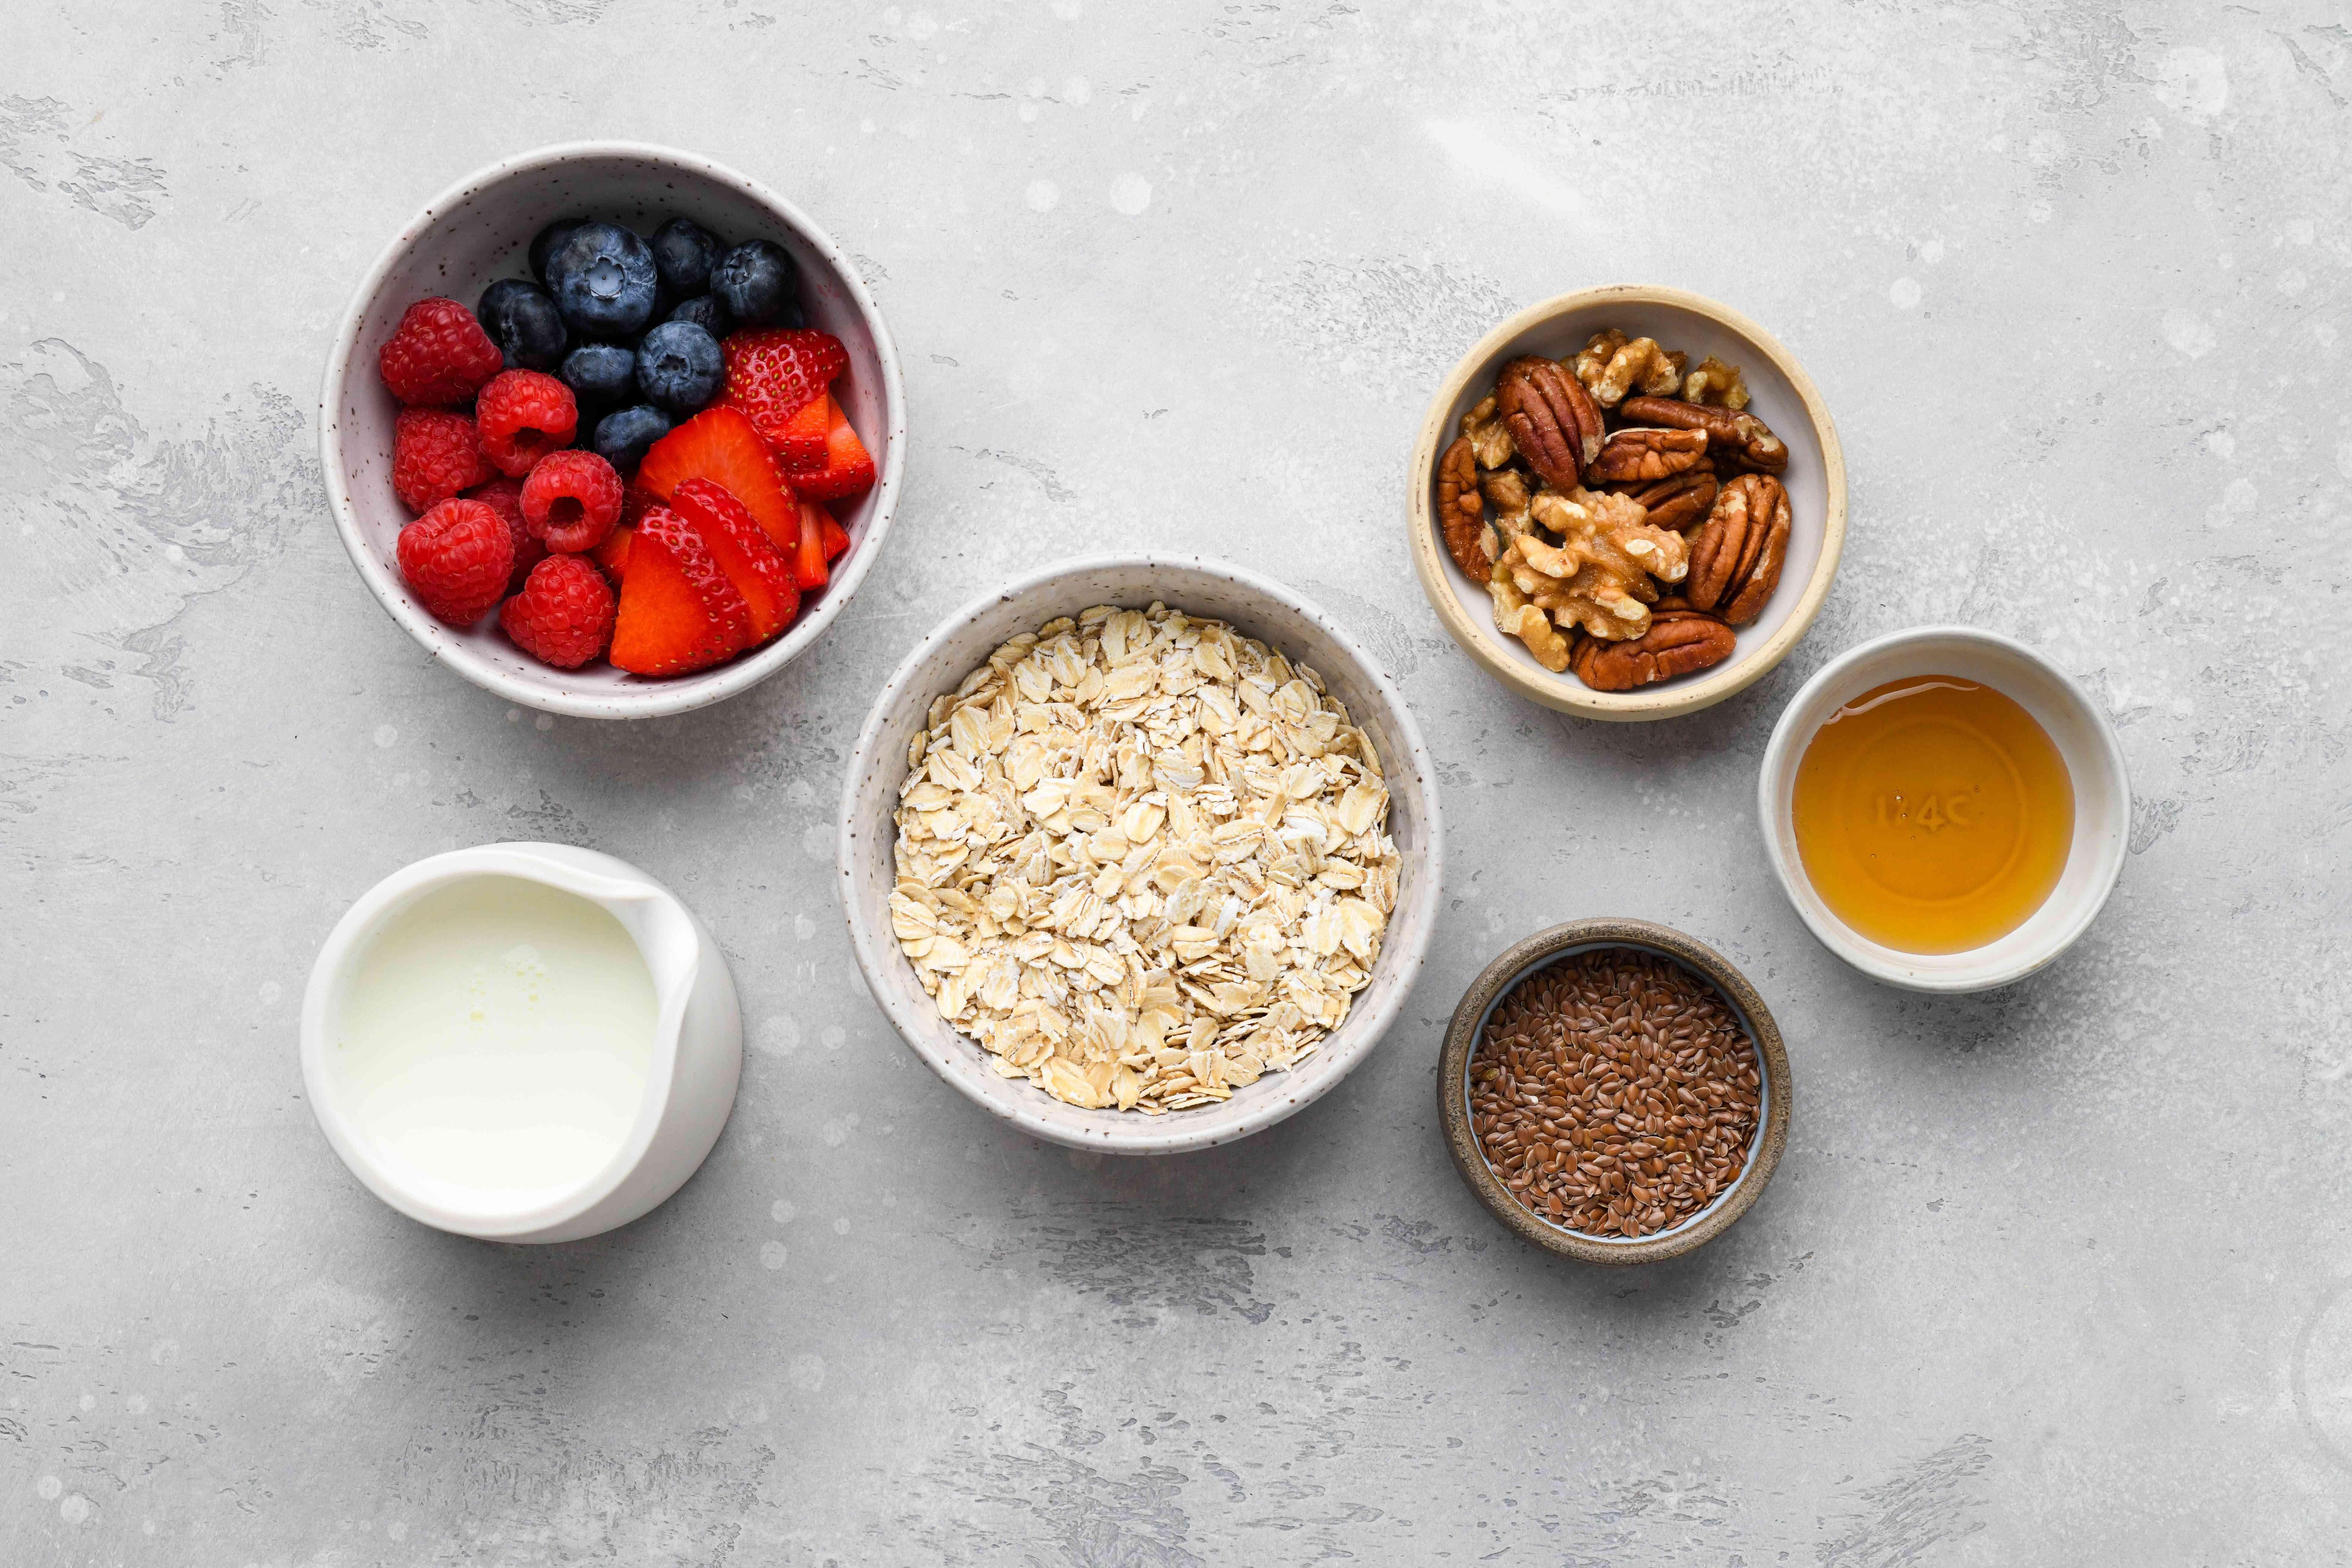 Gluten-Free Overnight Oats ingredients